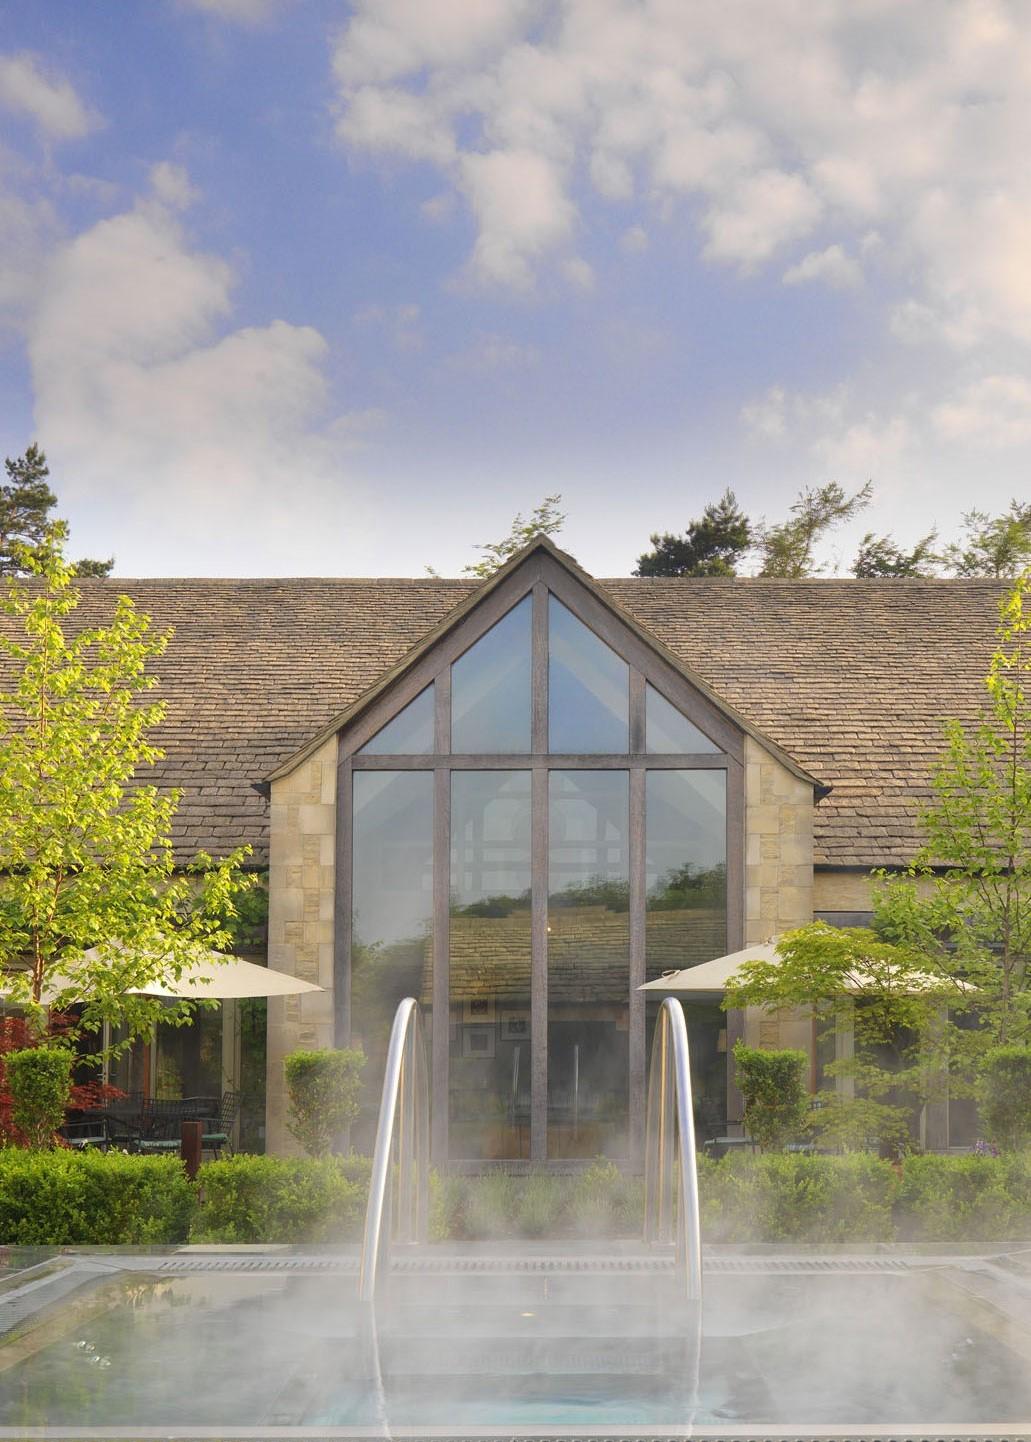 Calcot Manor Spa for a branding retreat